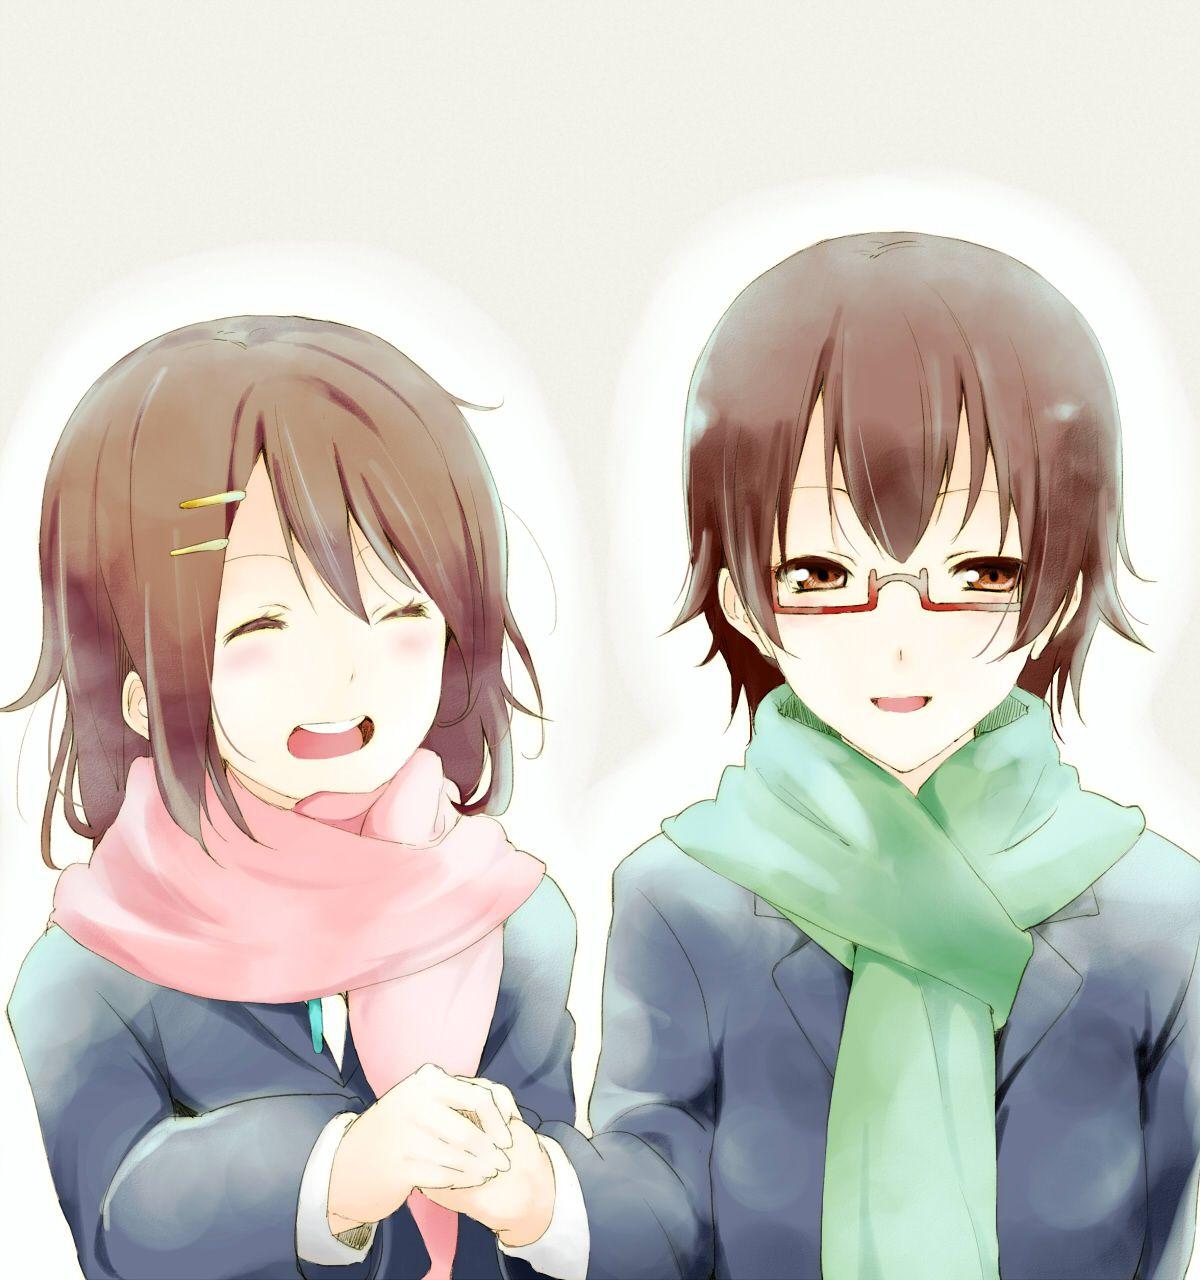 Yui and Nodoka KOn